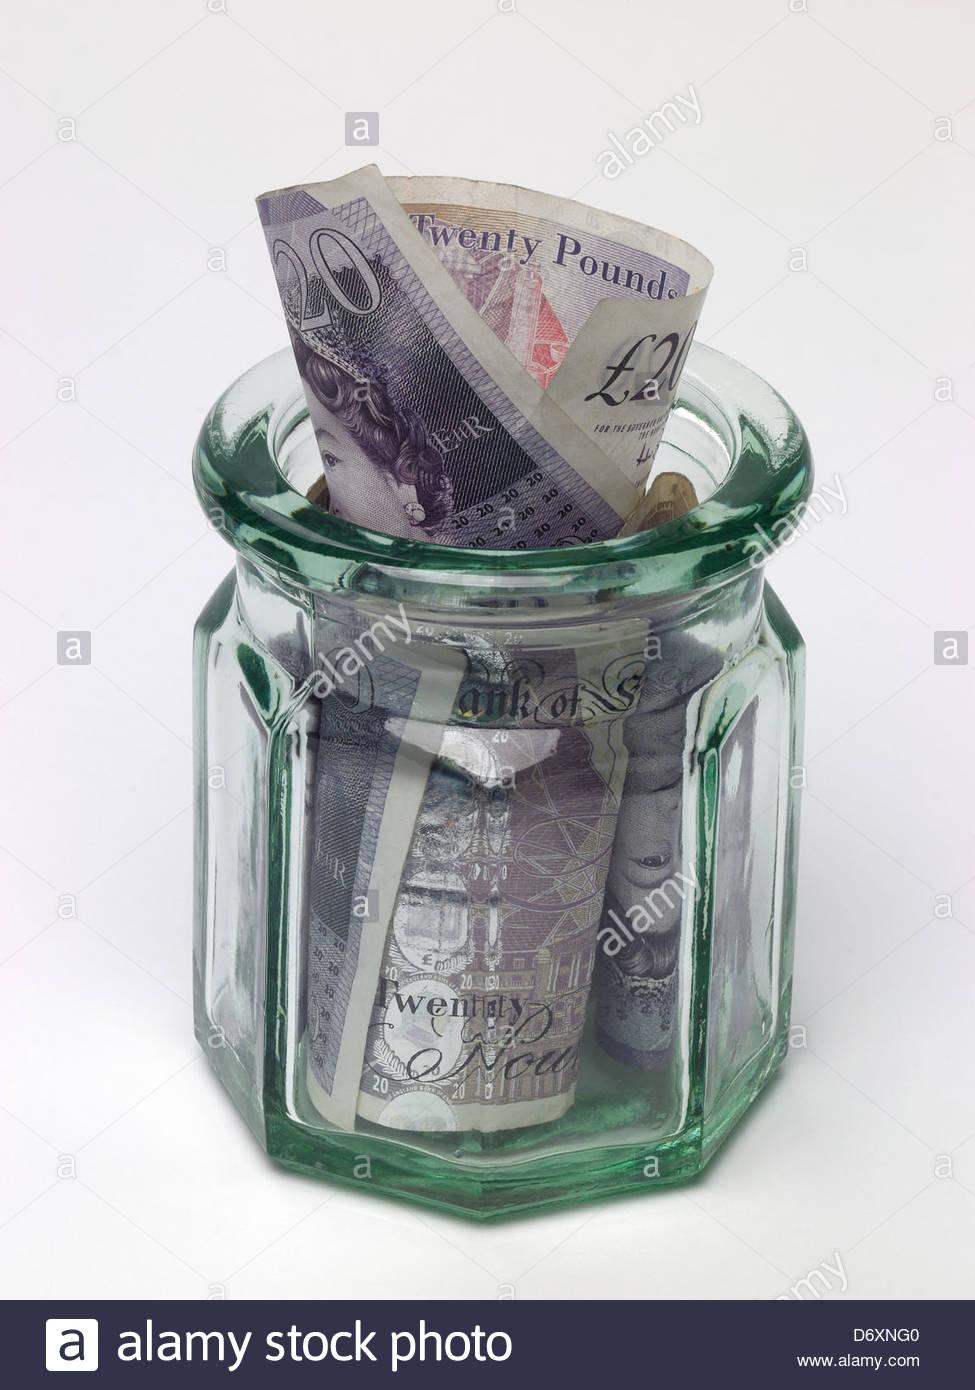 Jam jar with 20 pound notes - Stock Image